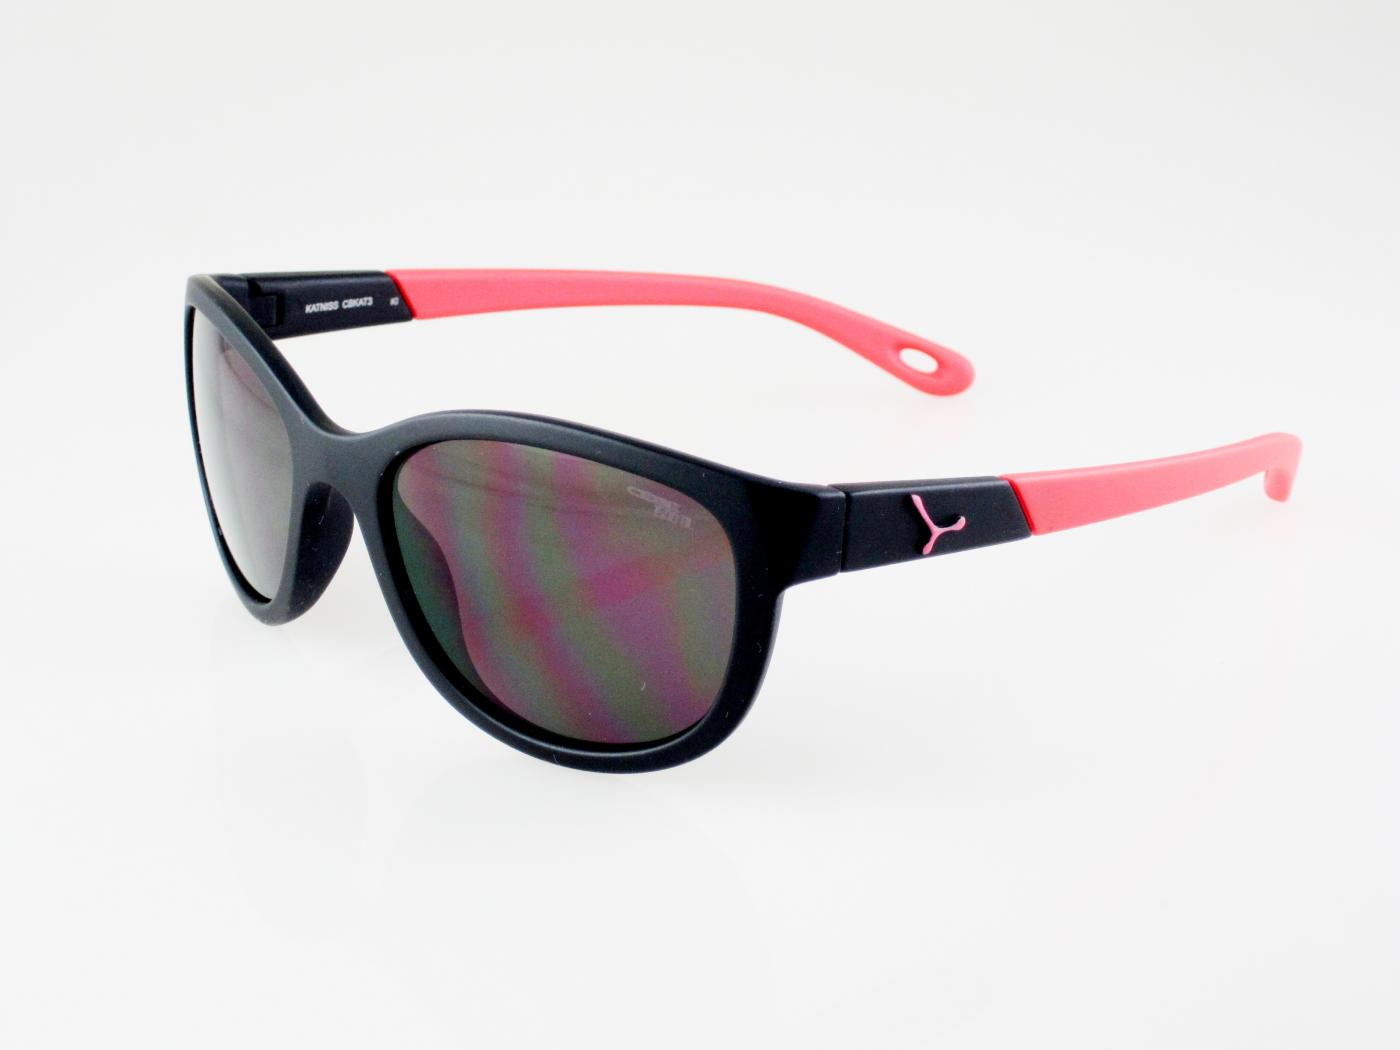 Detské slnečné okuliare Katniss ebef5189af5